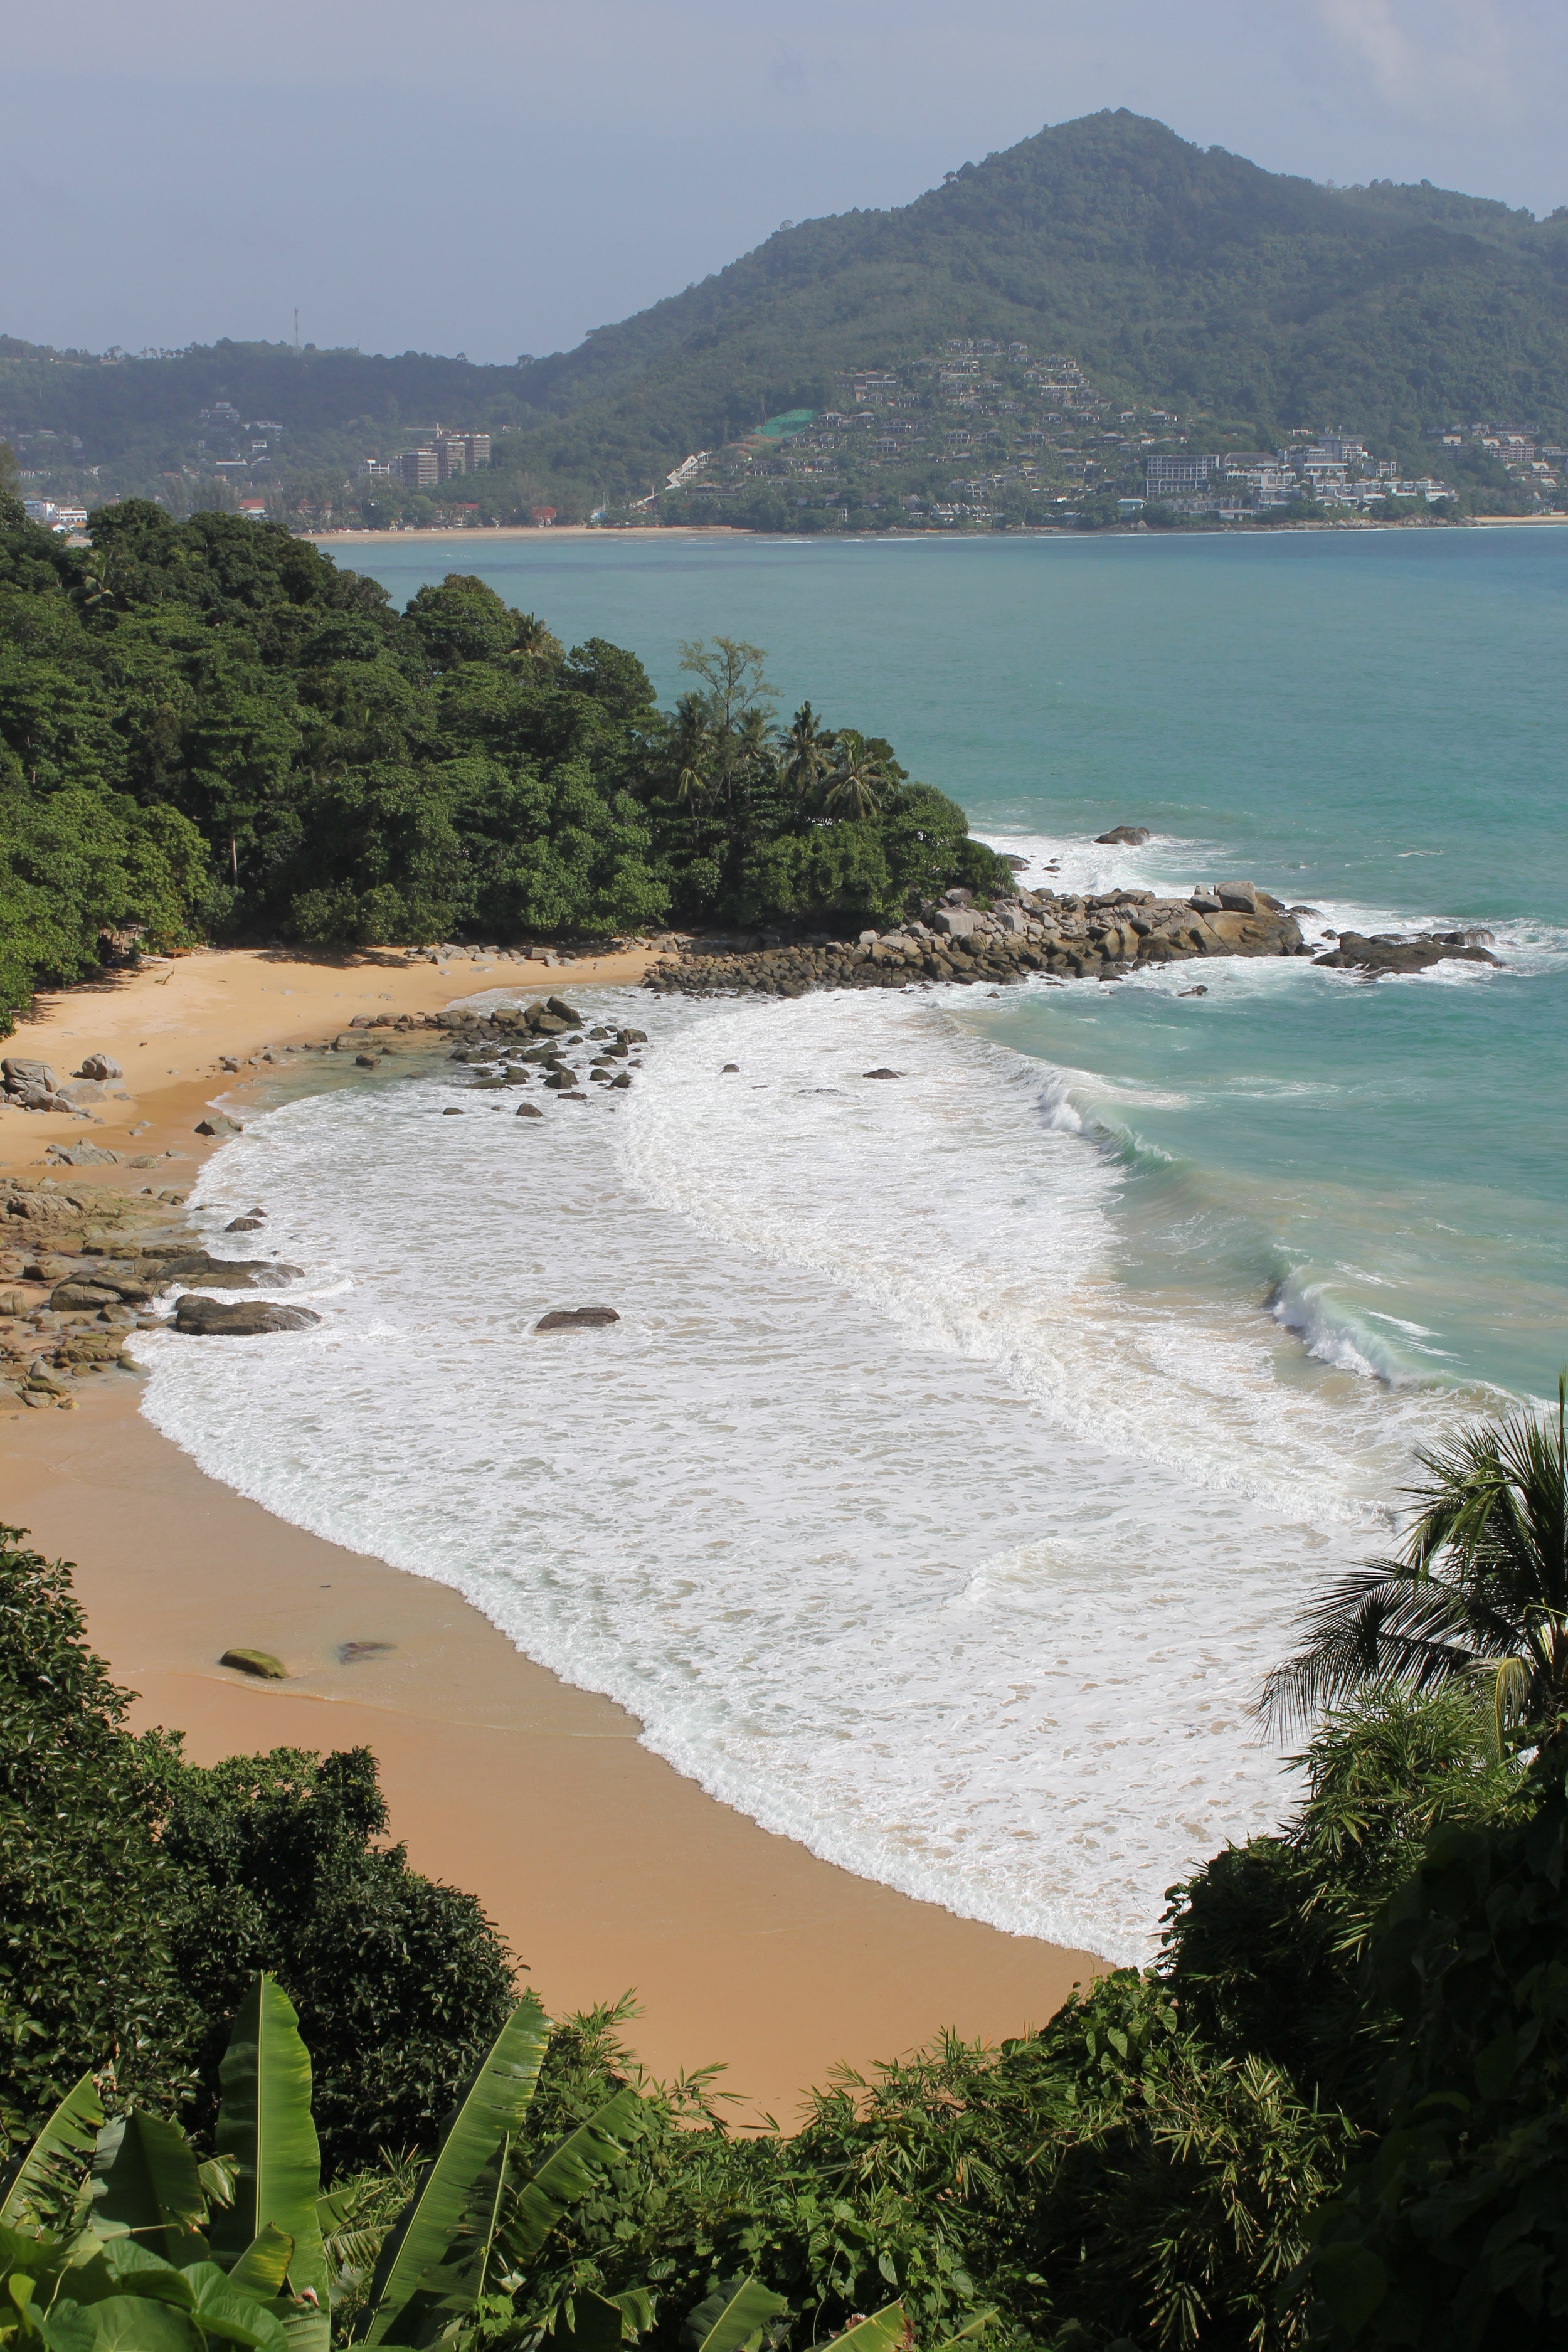 One of the many stunning beaches on Phuket's western side